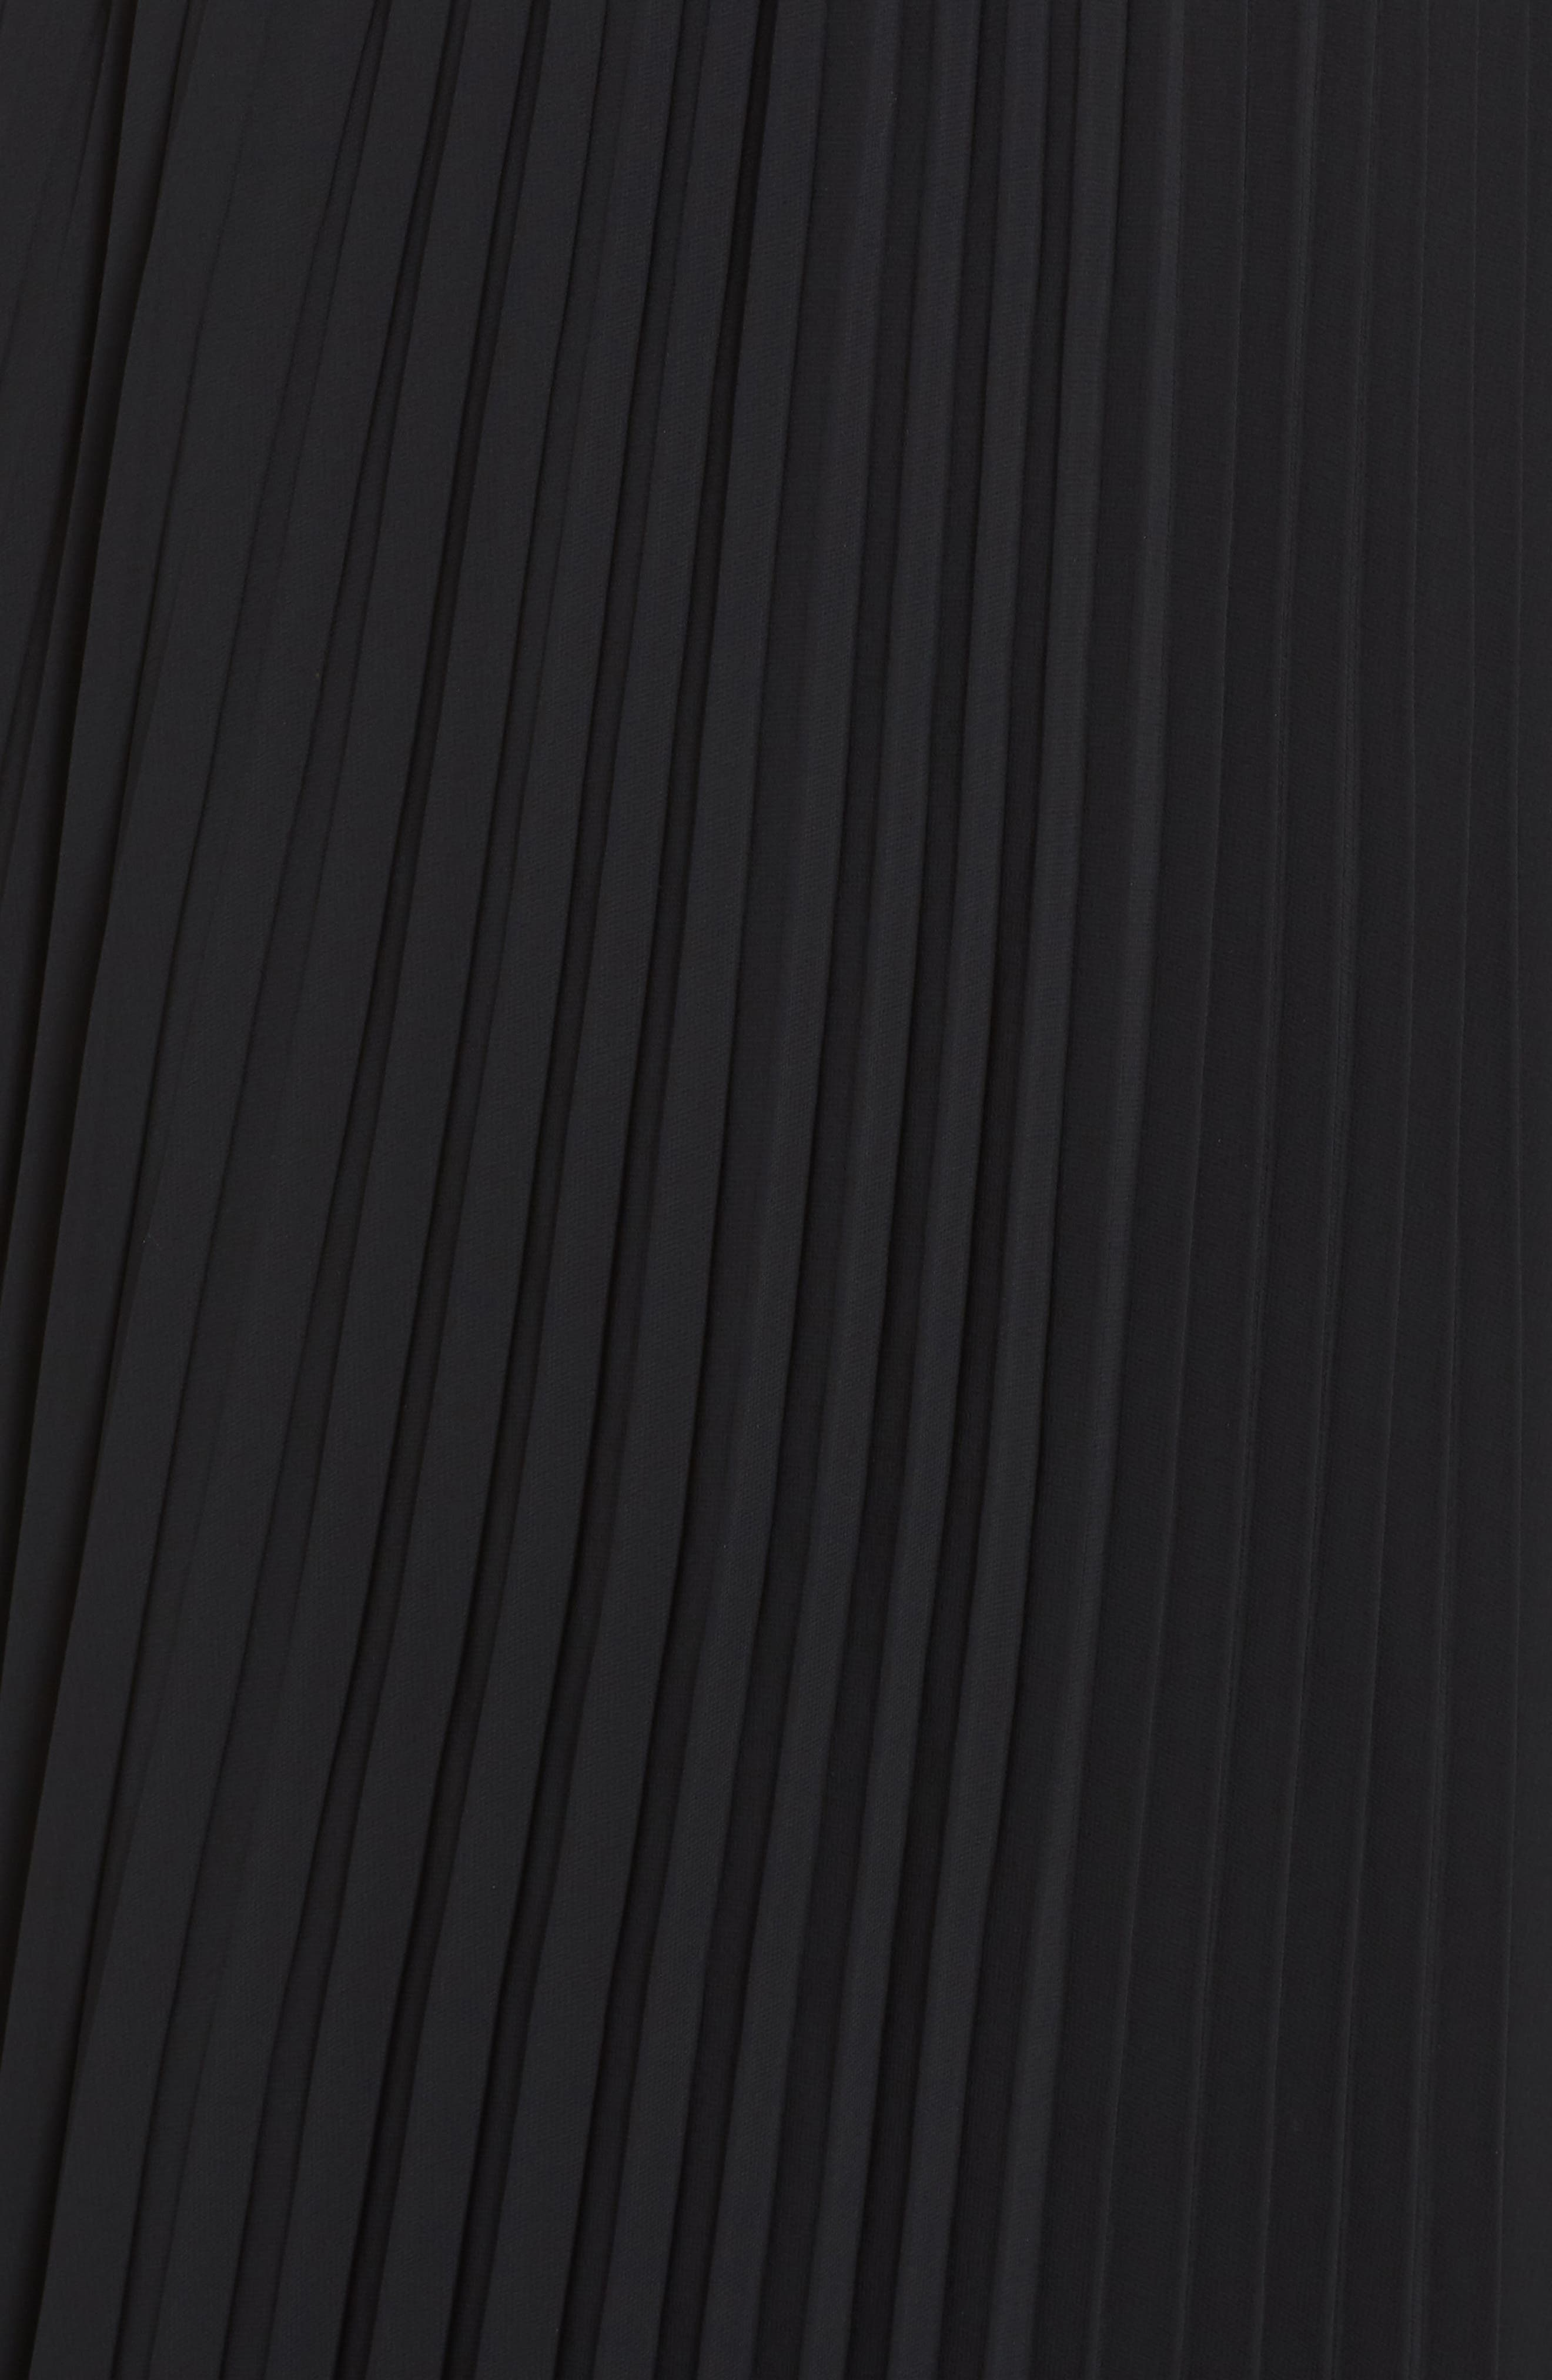 Long Pleated Chiffon Skirt,                             Alternate thumbnail 5, color,                             BLACK